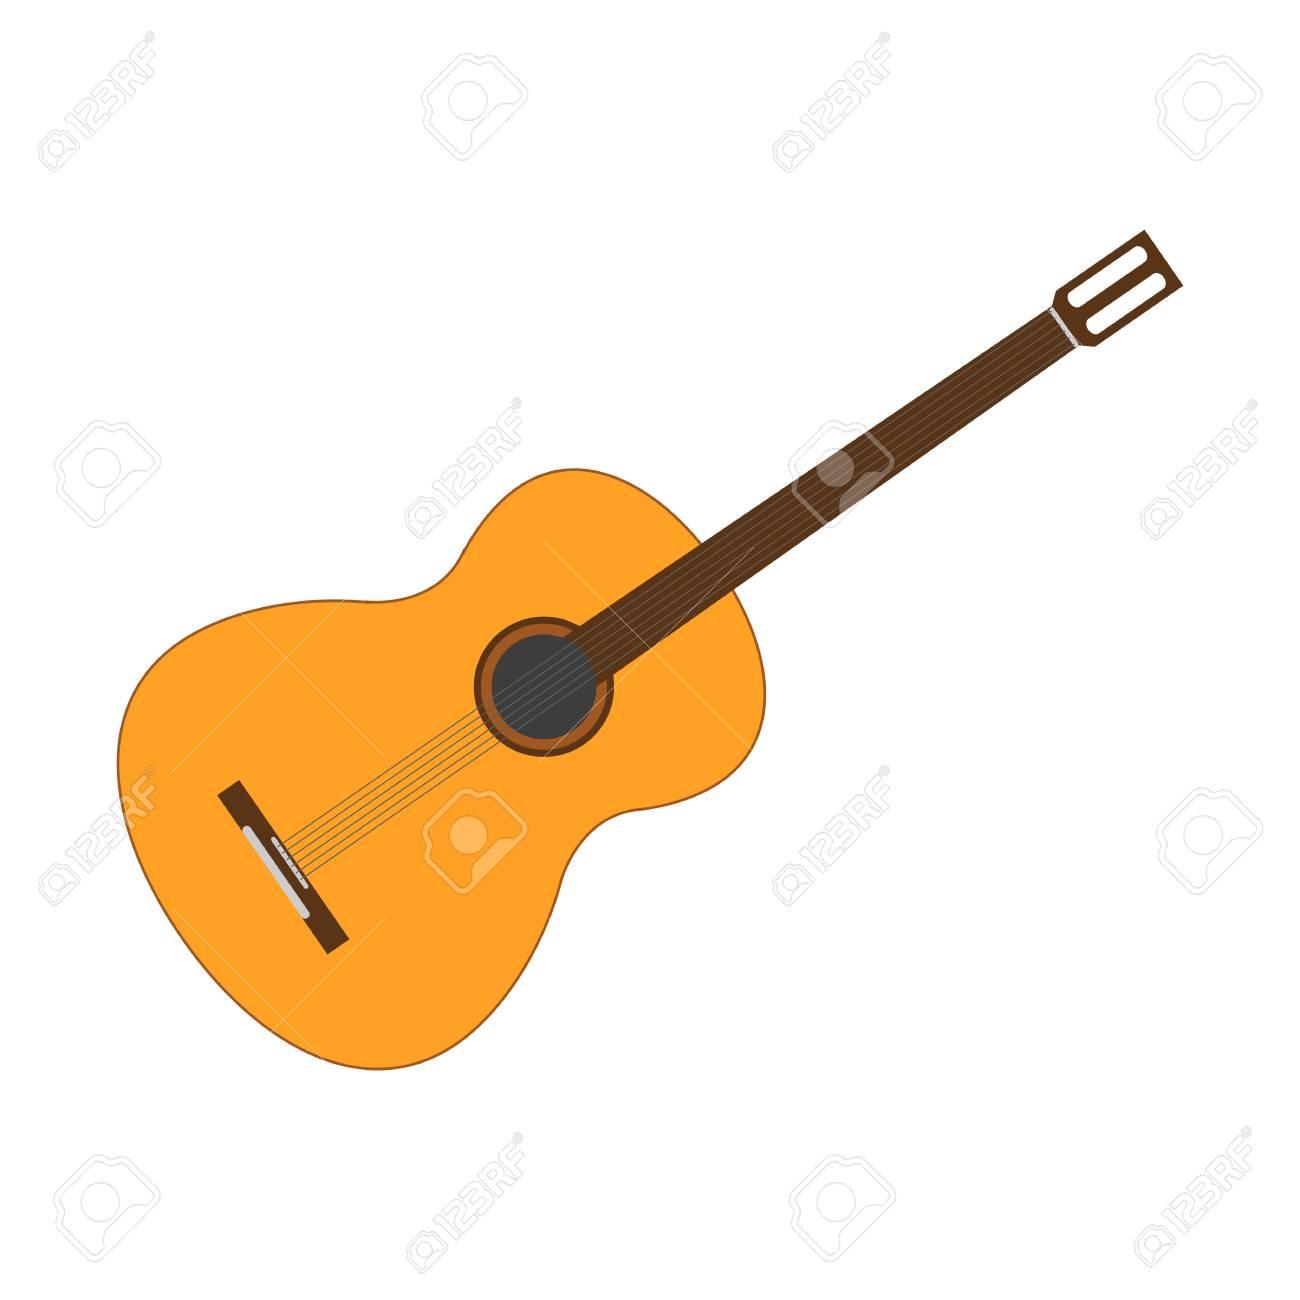 guitar icon vector illustration royalty free cliparts vectors rh 123rf com guitars victoria bc